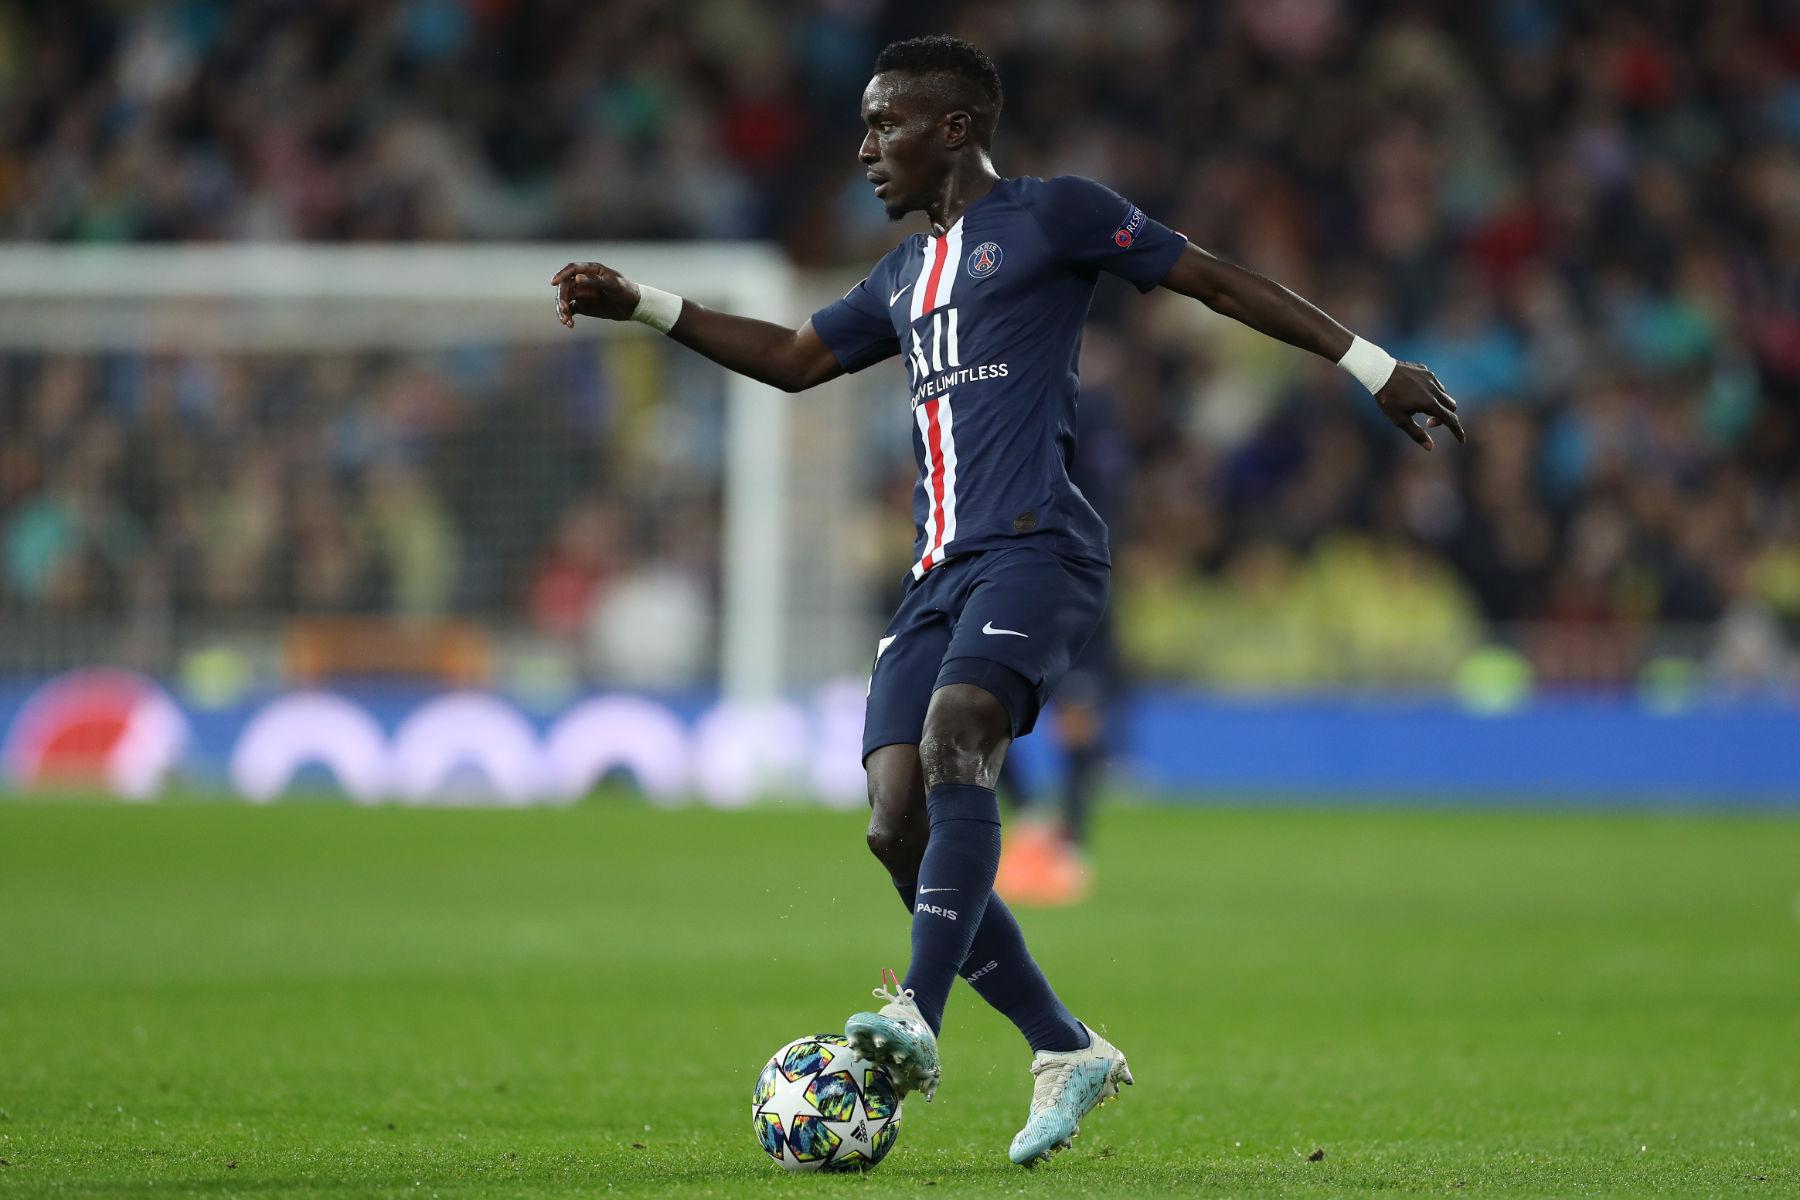 Idrissa Gueye [PHOTO CREDIT: PSG Talk]